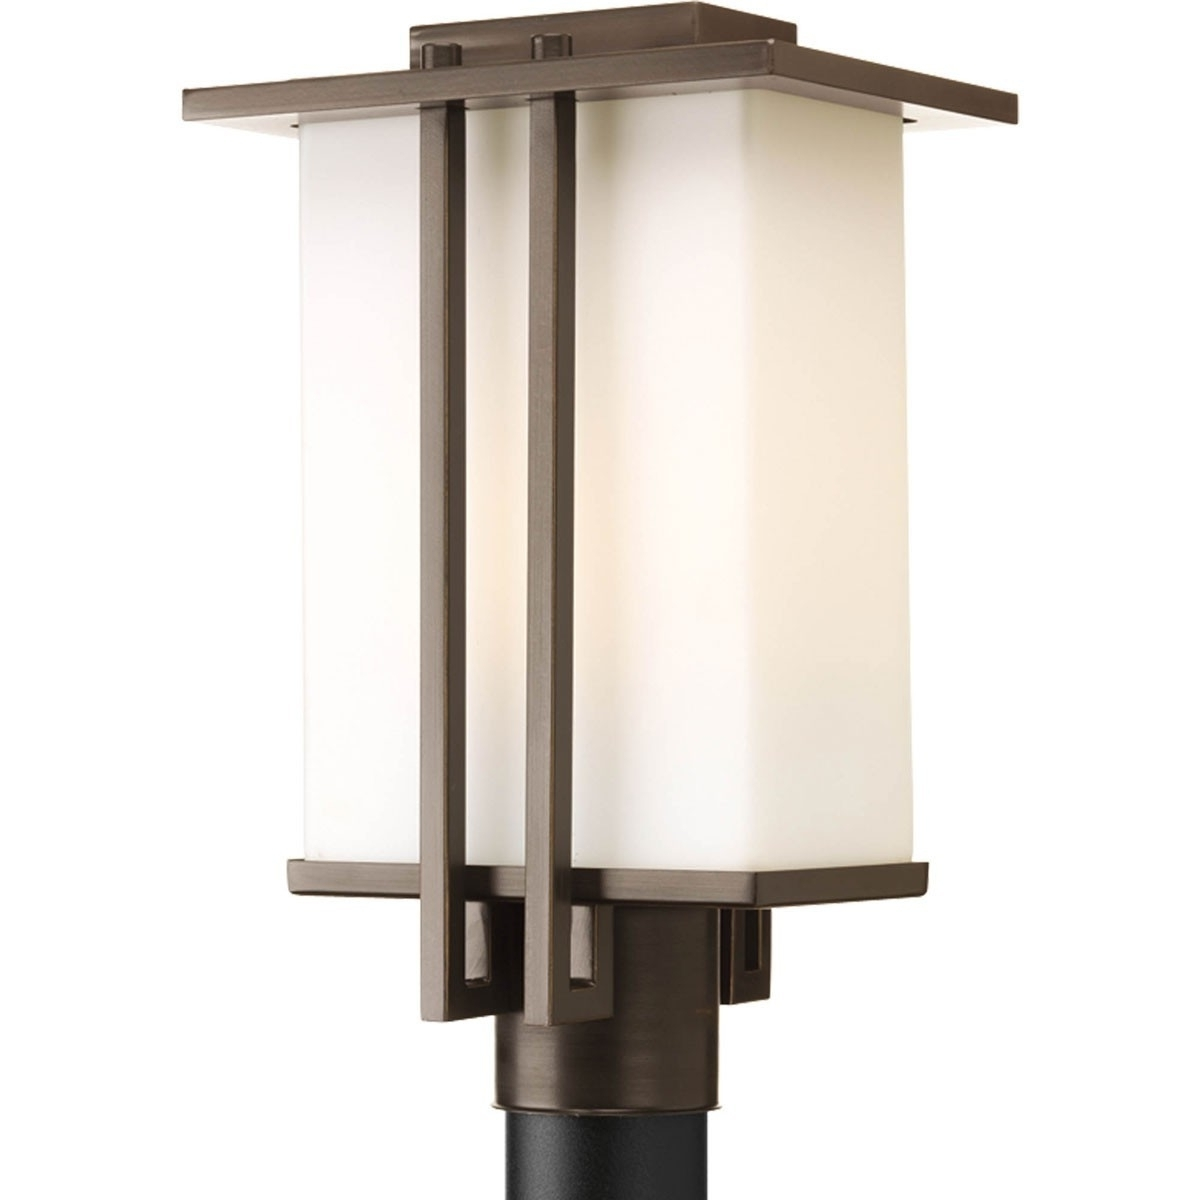 Latest Exterior Pole Lighting Fixtures – Lighting Fixtures In Outdoor Pole Lanterns (View 13 of 20)